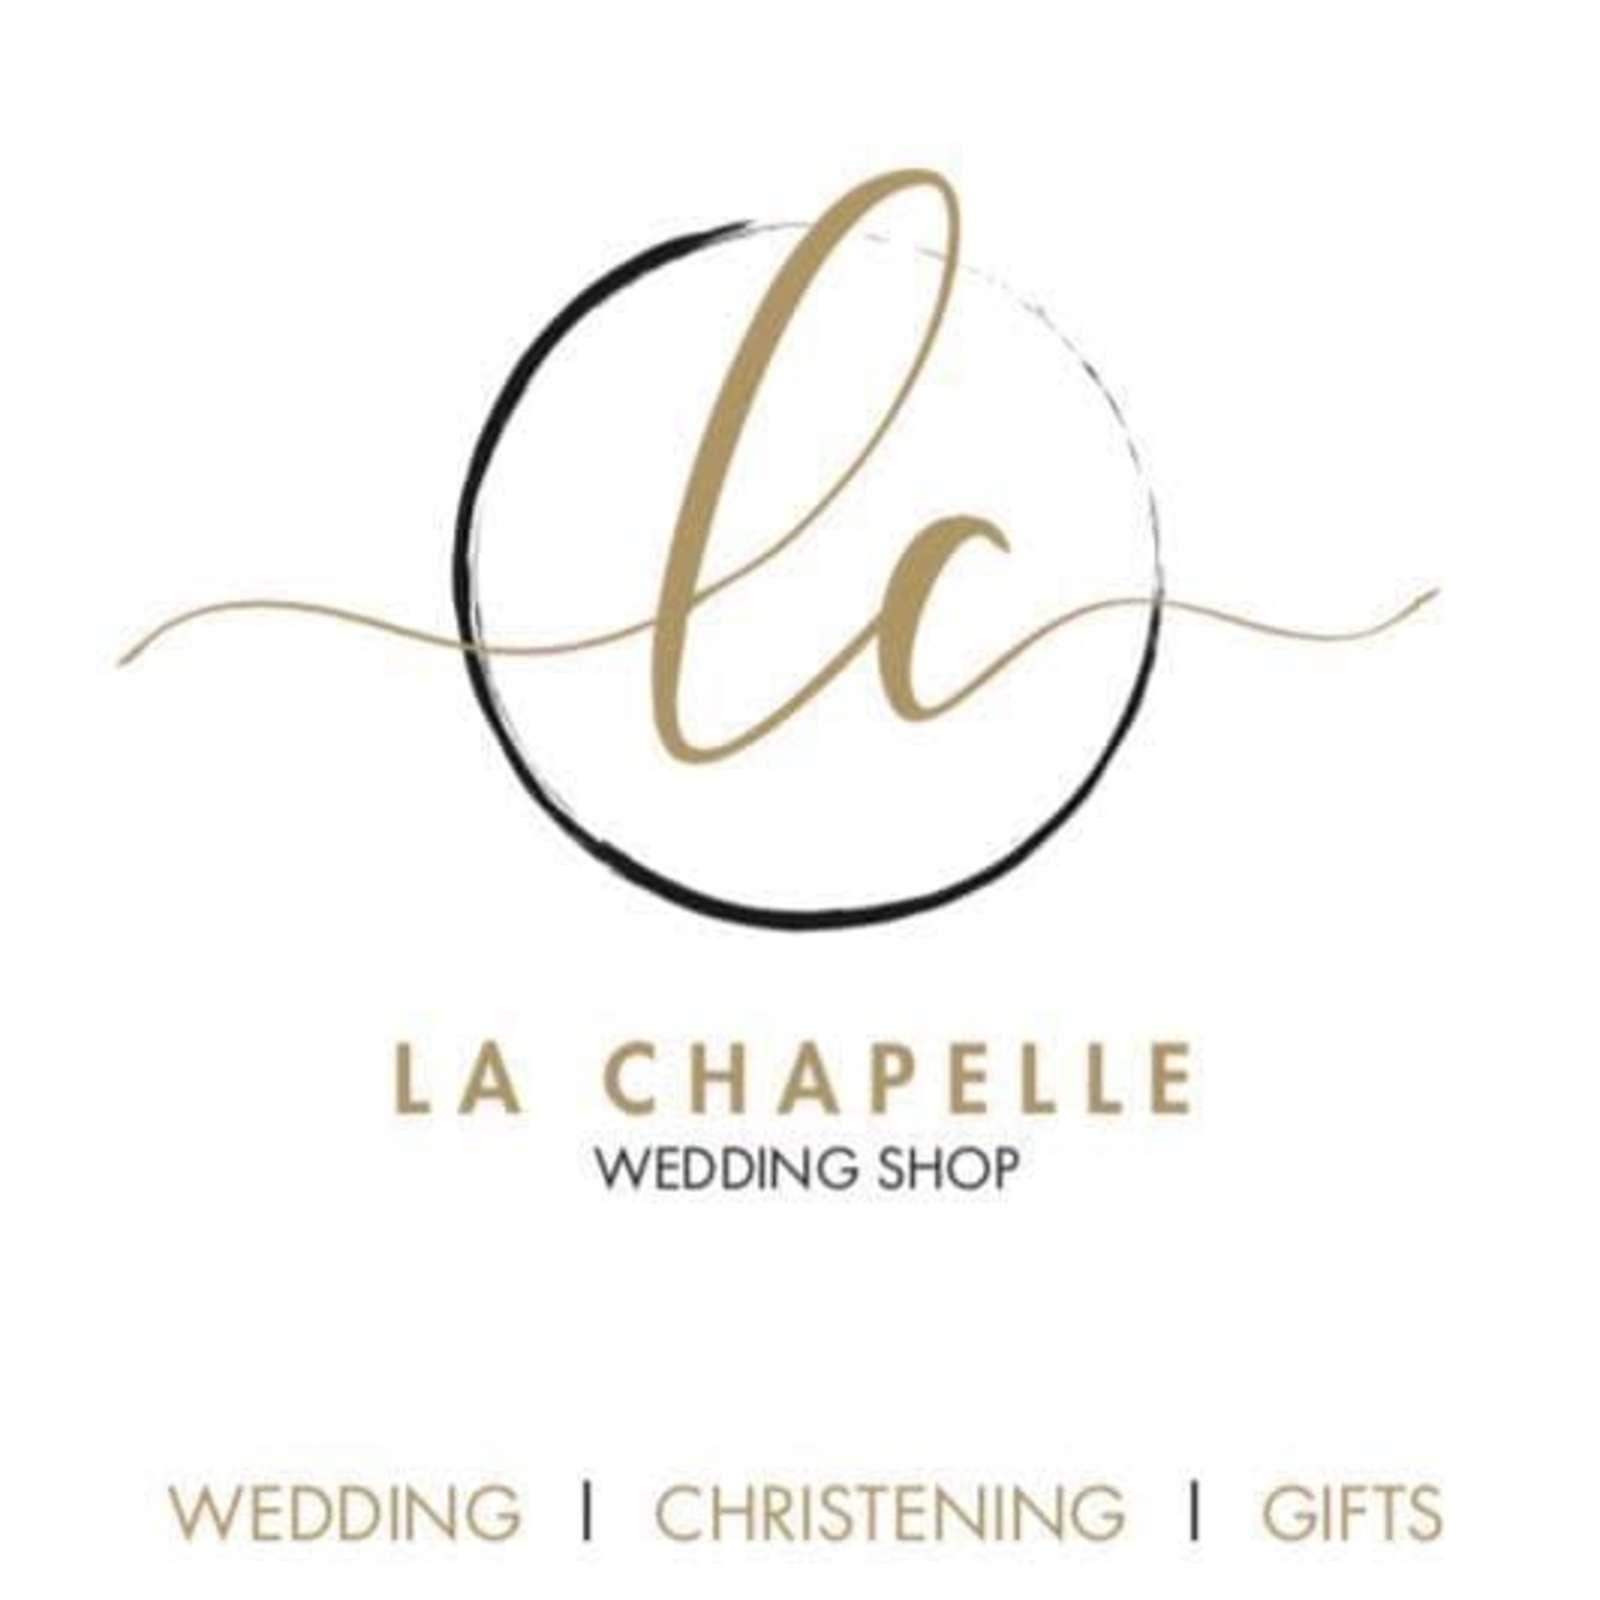 La Chapelle Wedding Shop Γάμος Βάπτιση Είδη Δώρων